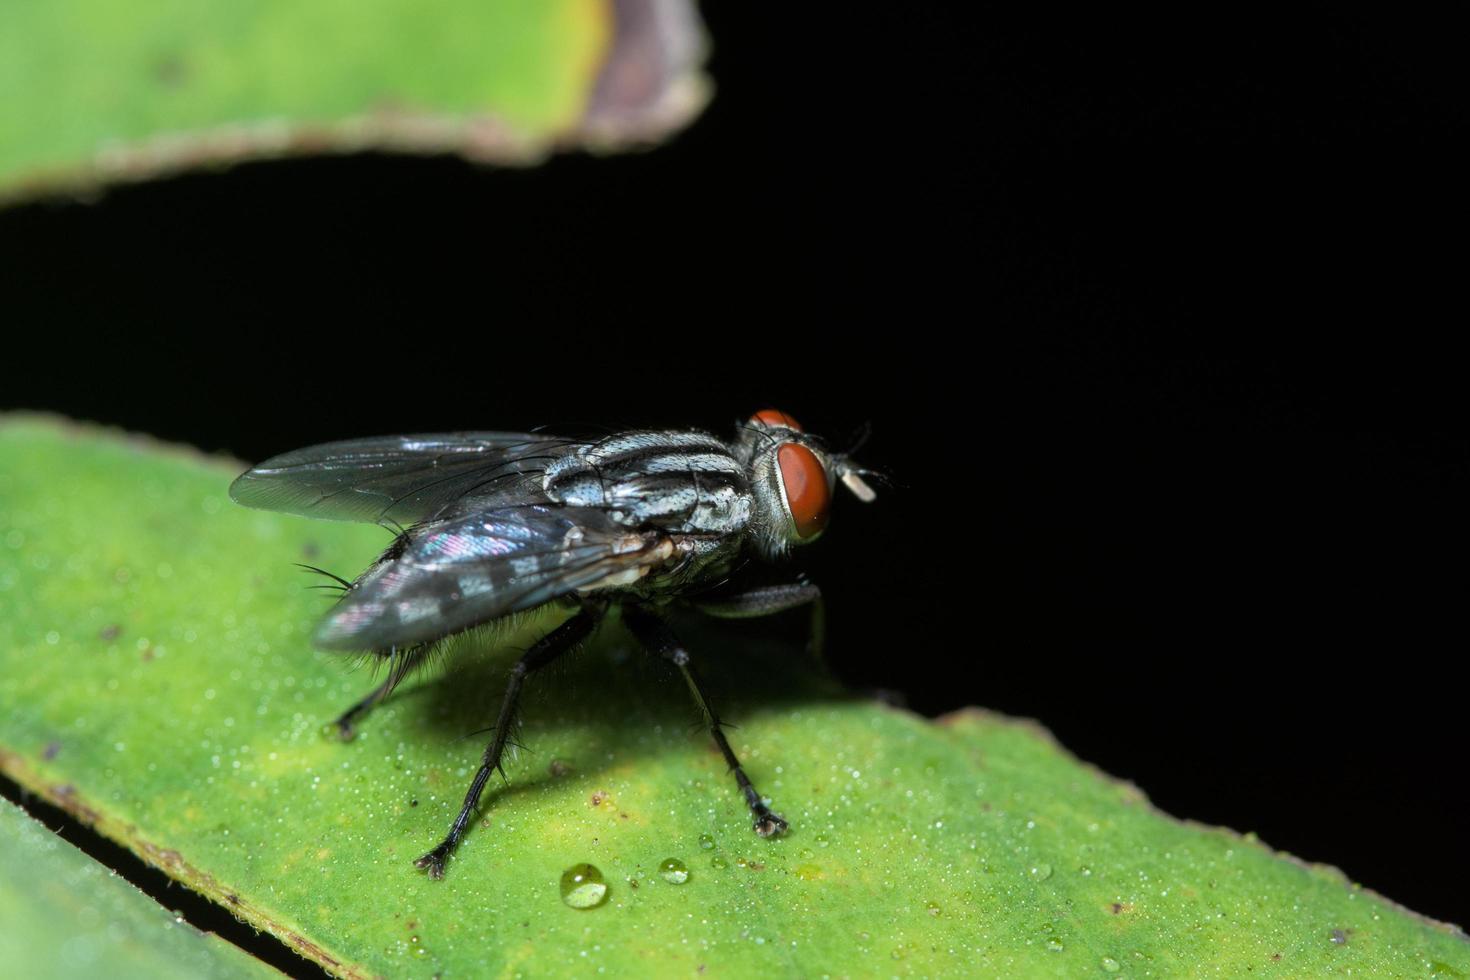 Macro fly on leaf photo